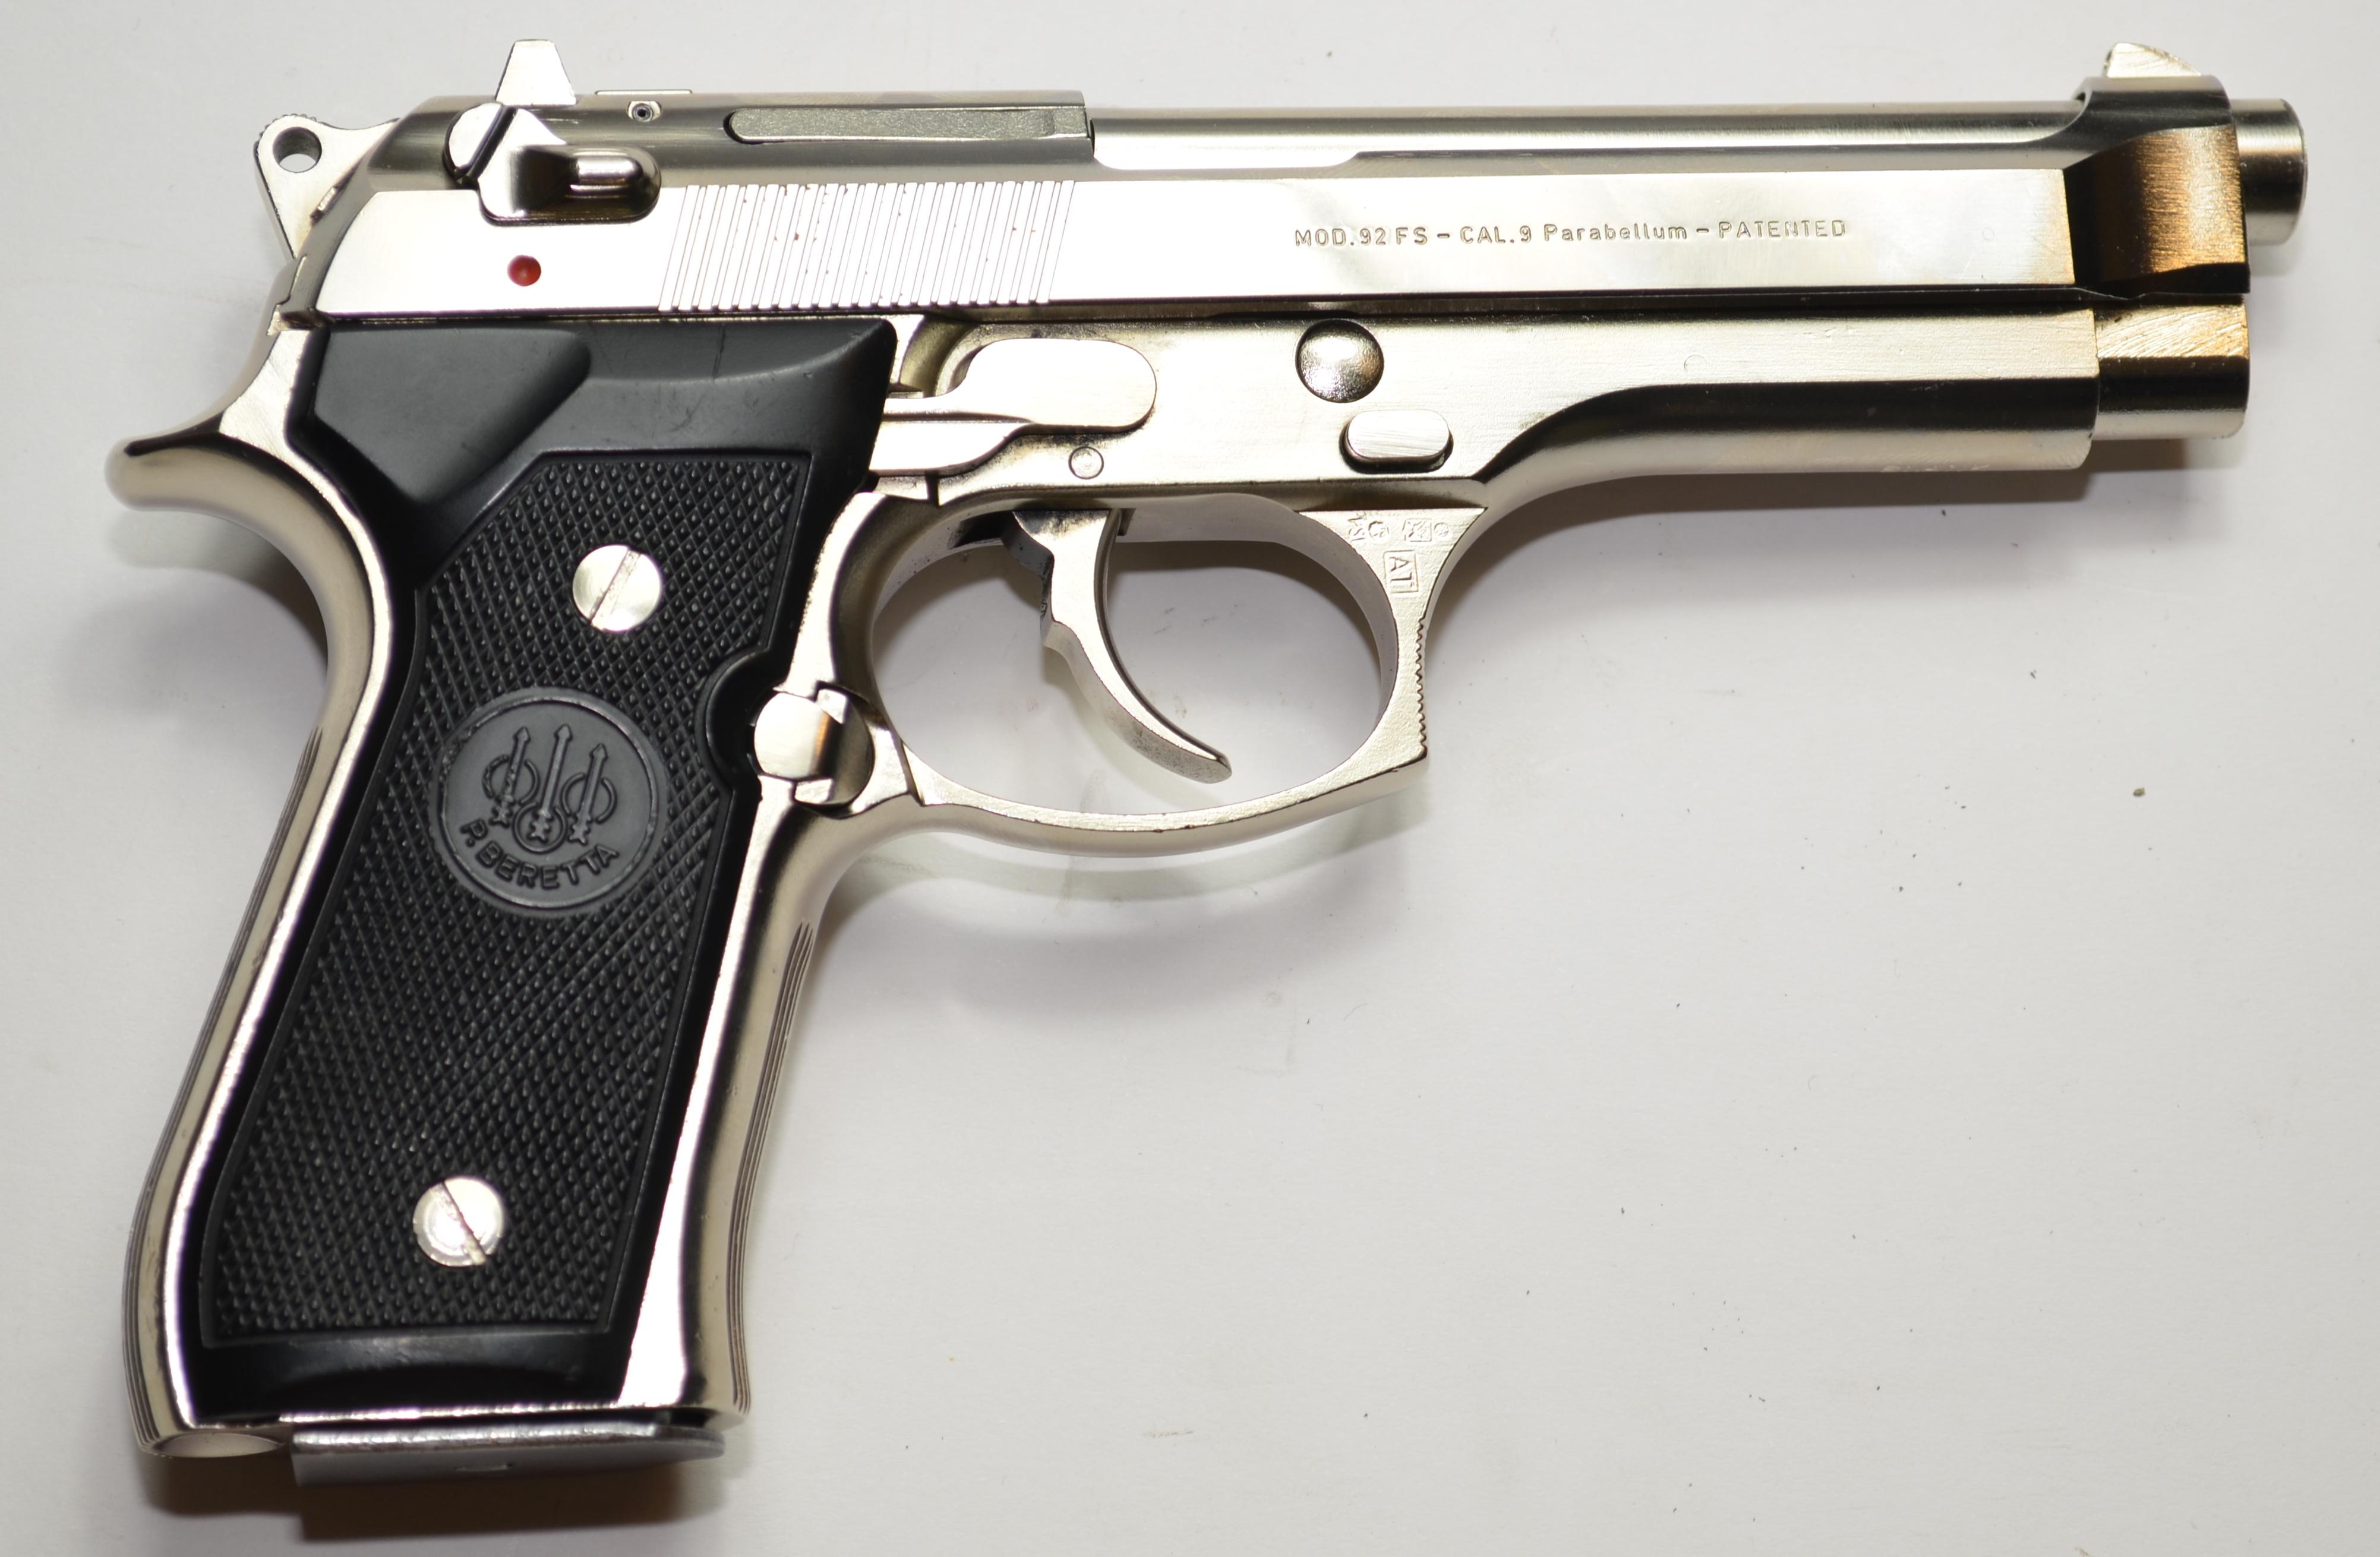 Beretta 92 chrome